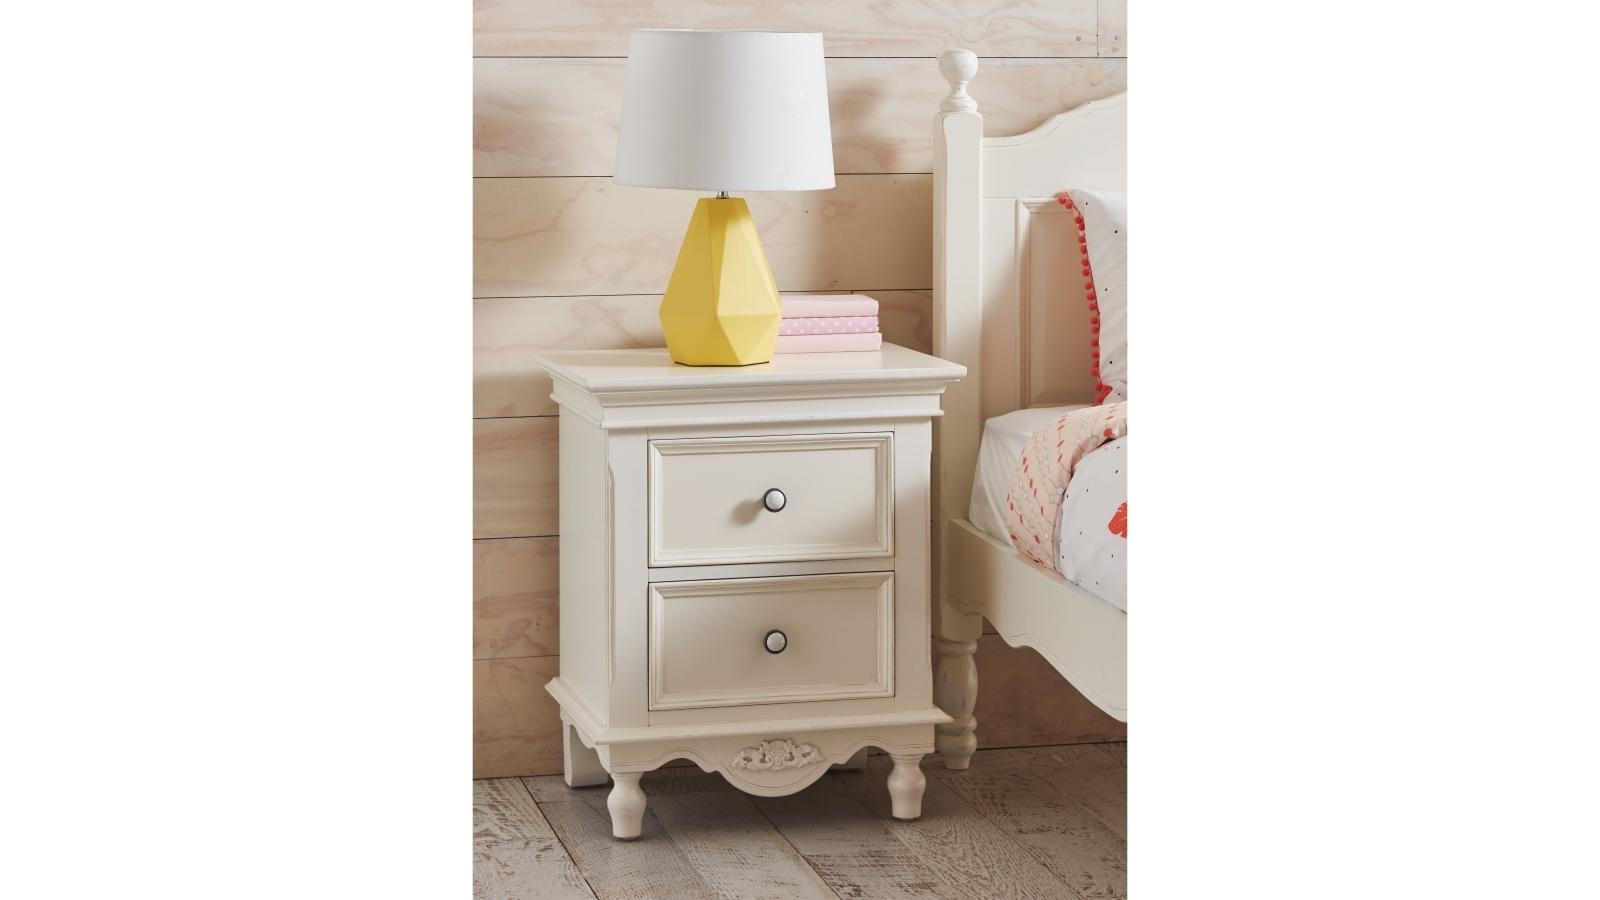 Buy St Louis 2 Drawer Bedside Table Harvey Norman Au